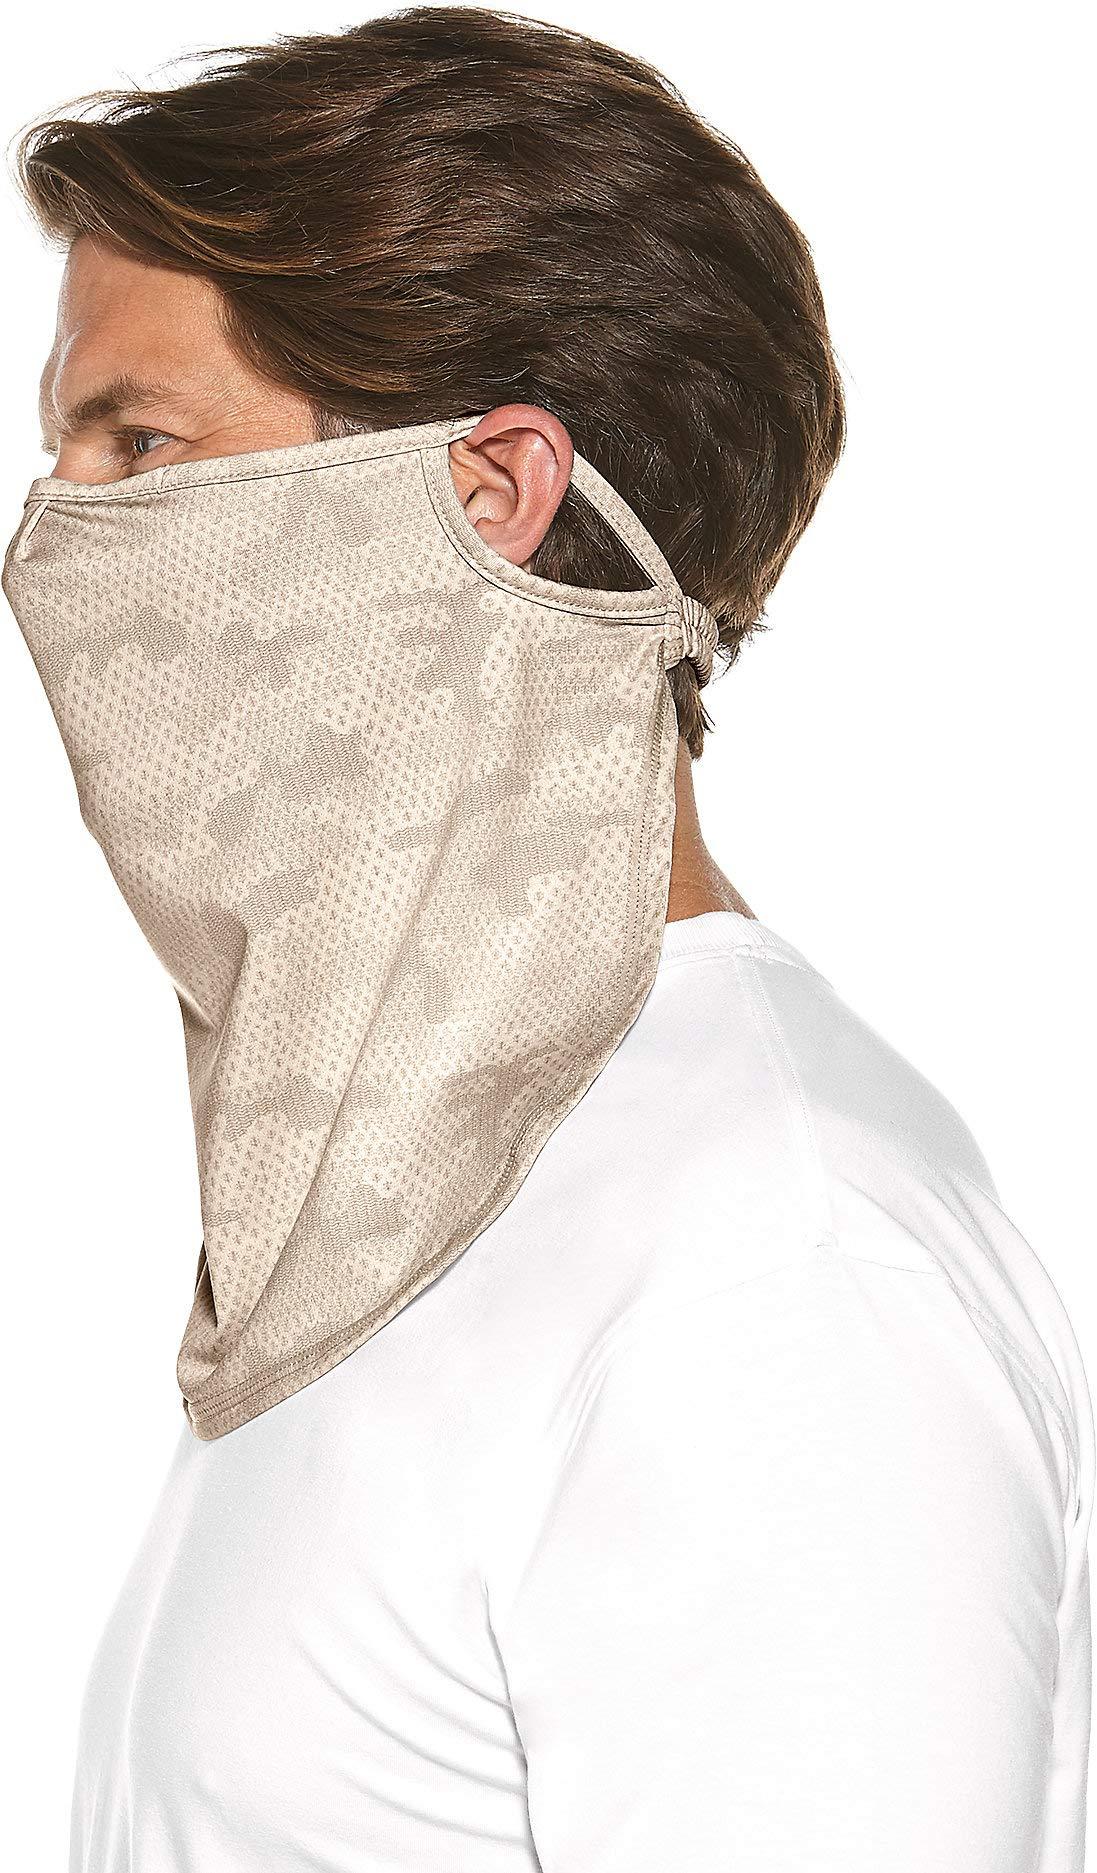 Coolibar UPF 50+ Unisex UV Face Mask - Sun Protective (Large/X-Large- Tan Coolibar Camo) by Coolibar (Image #2)